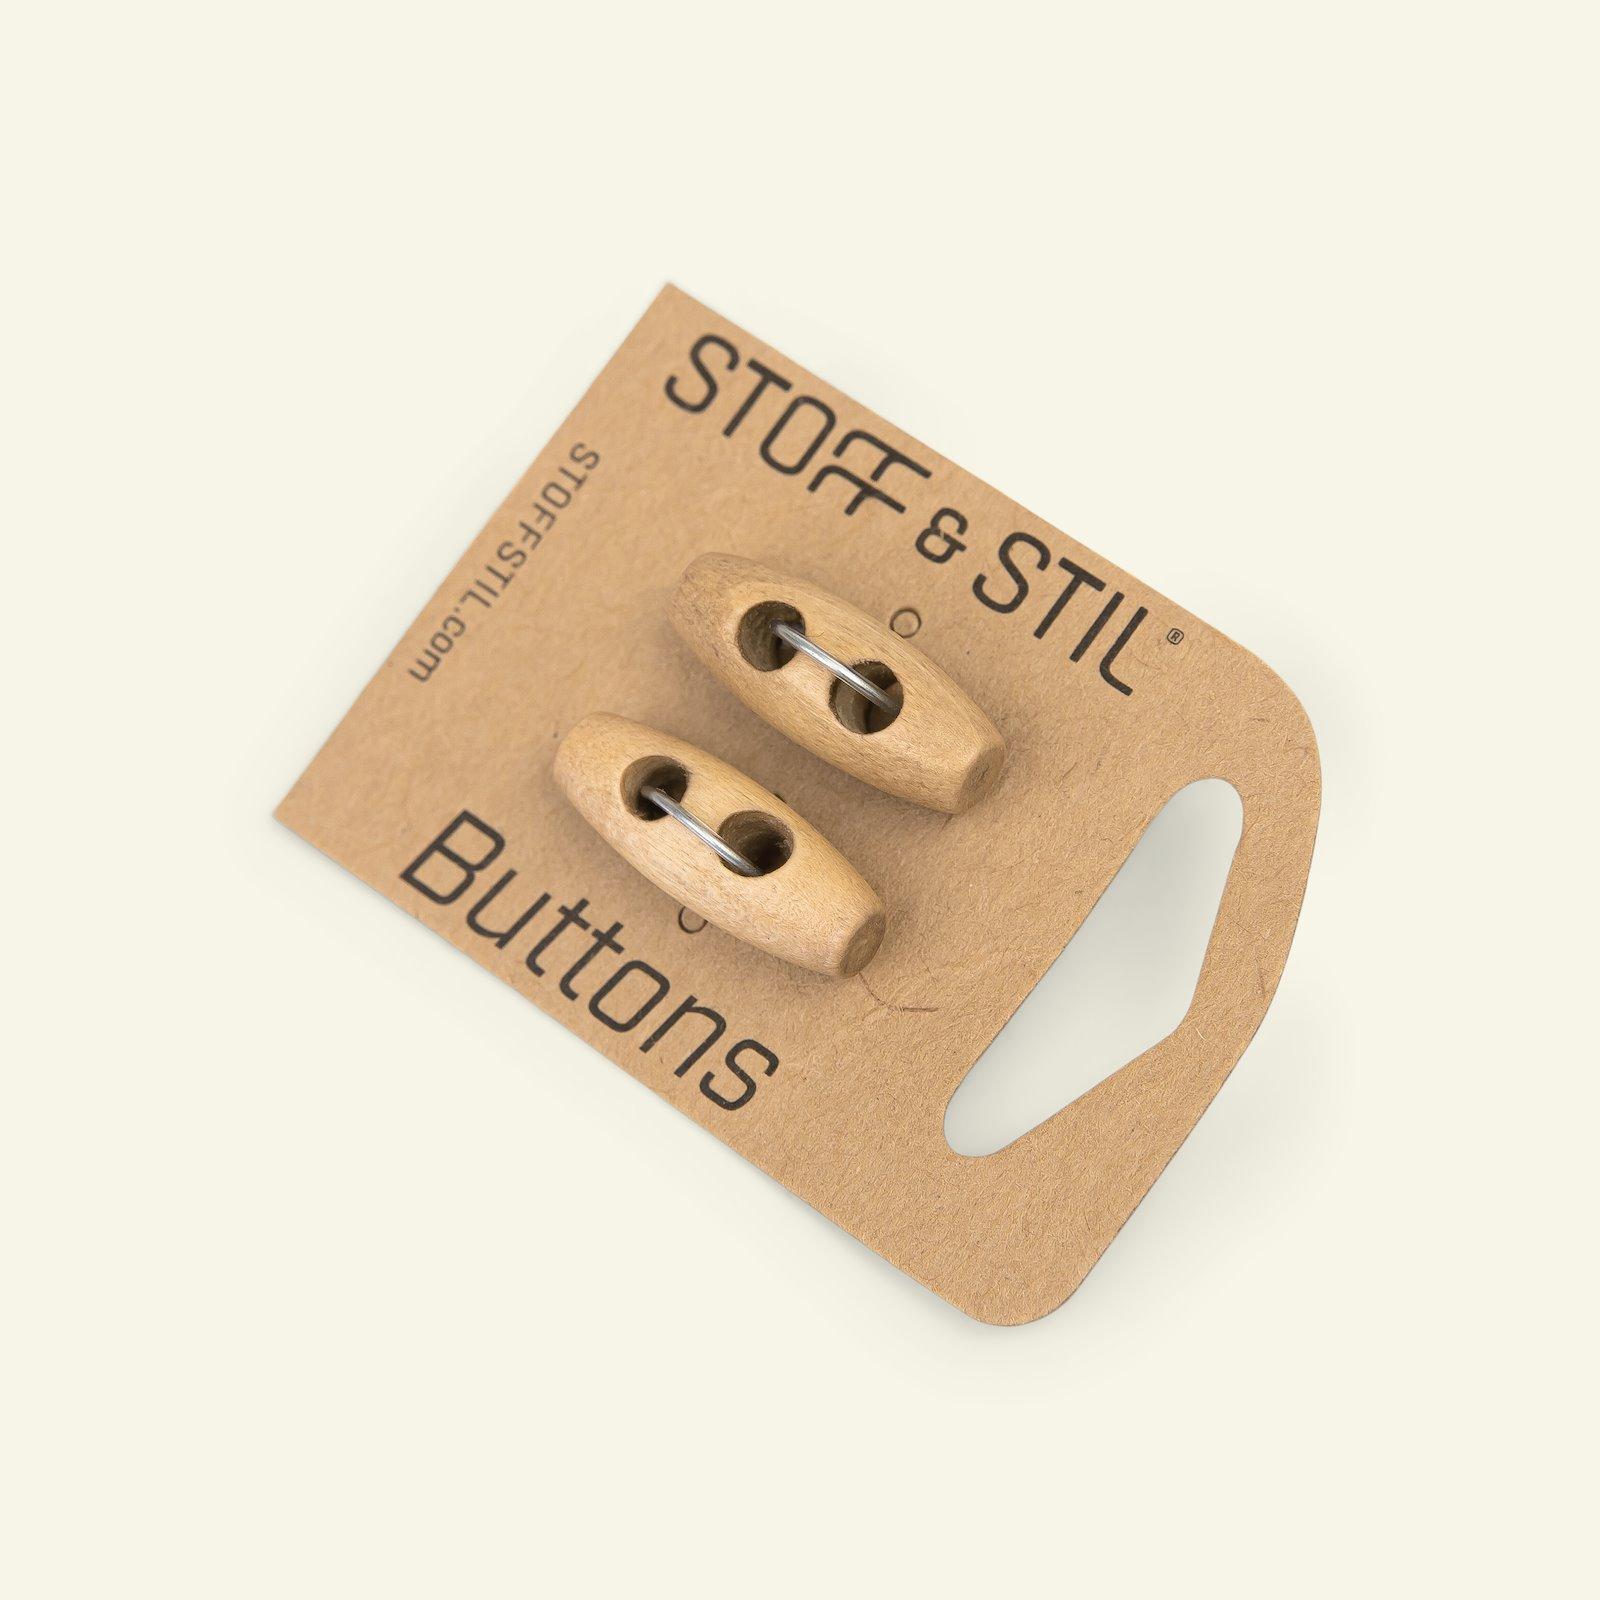 Toggle button duffel wood 23mm 2pcs 33507_pack_b